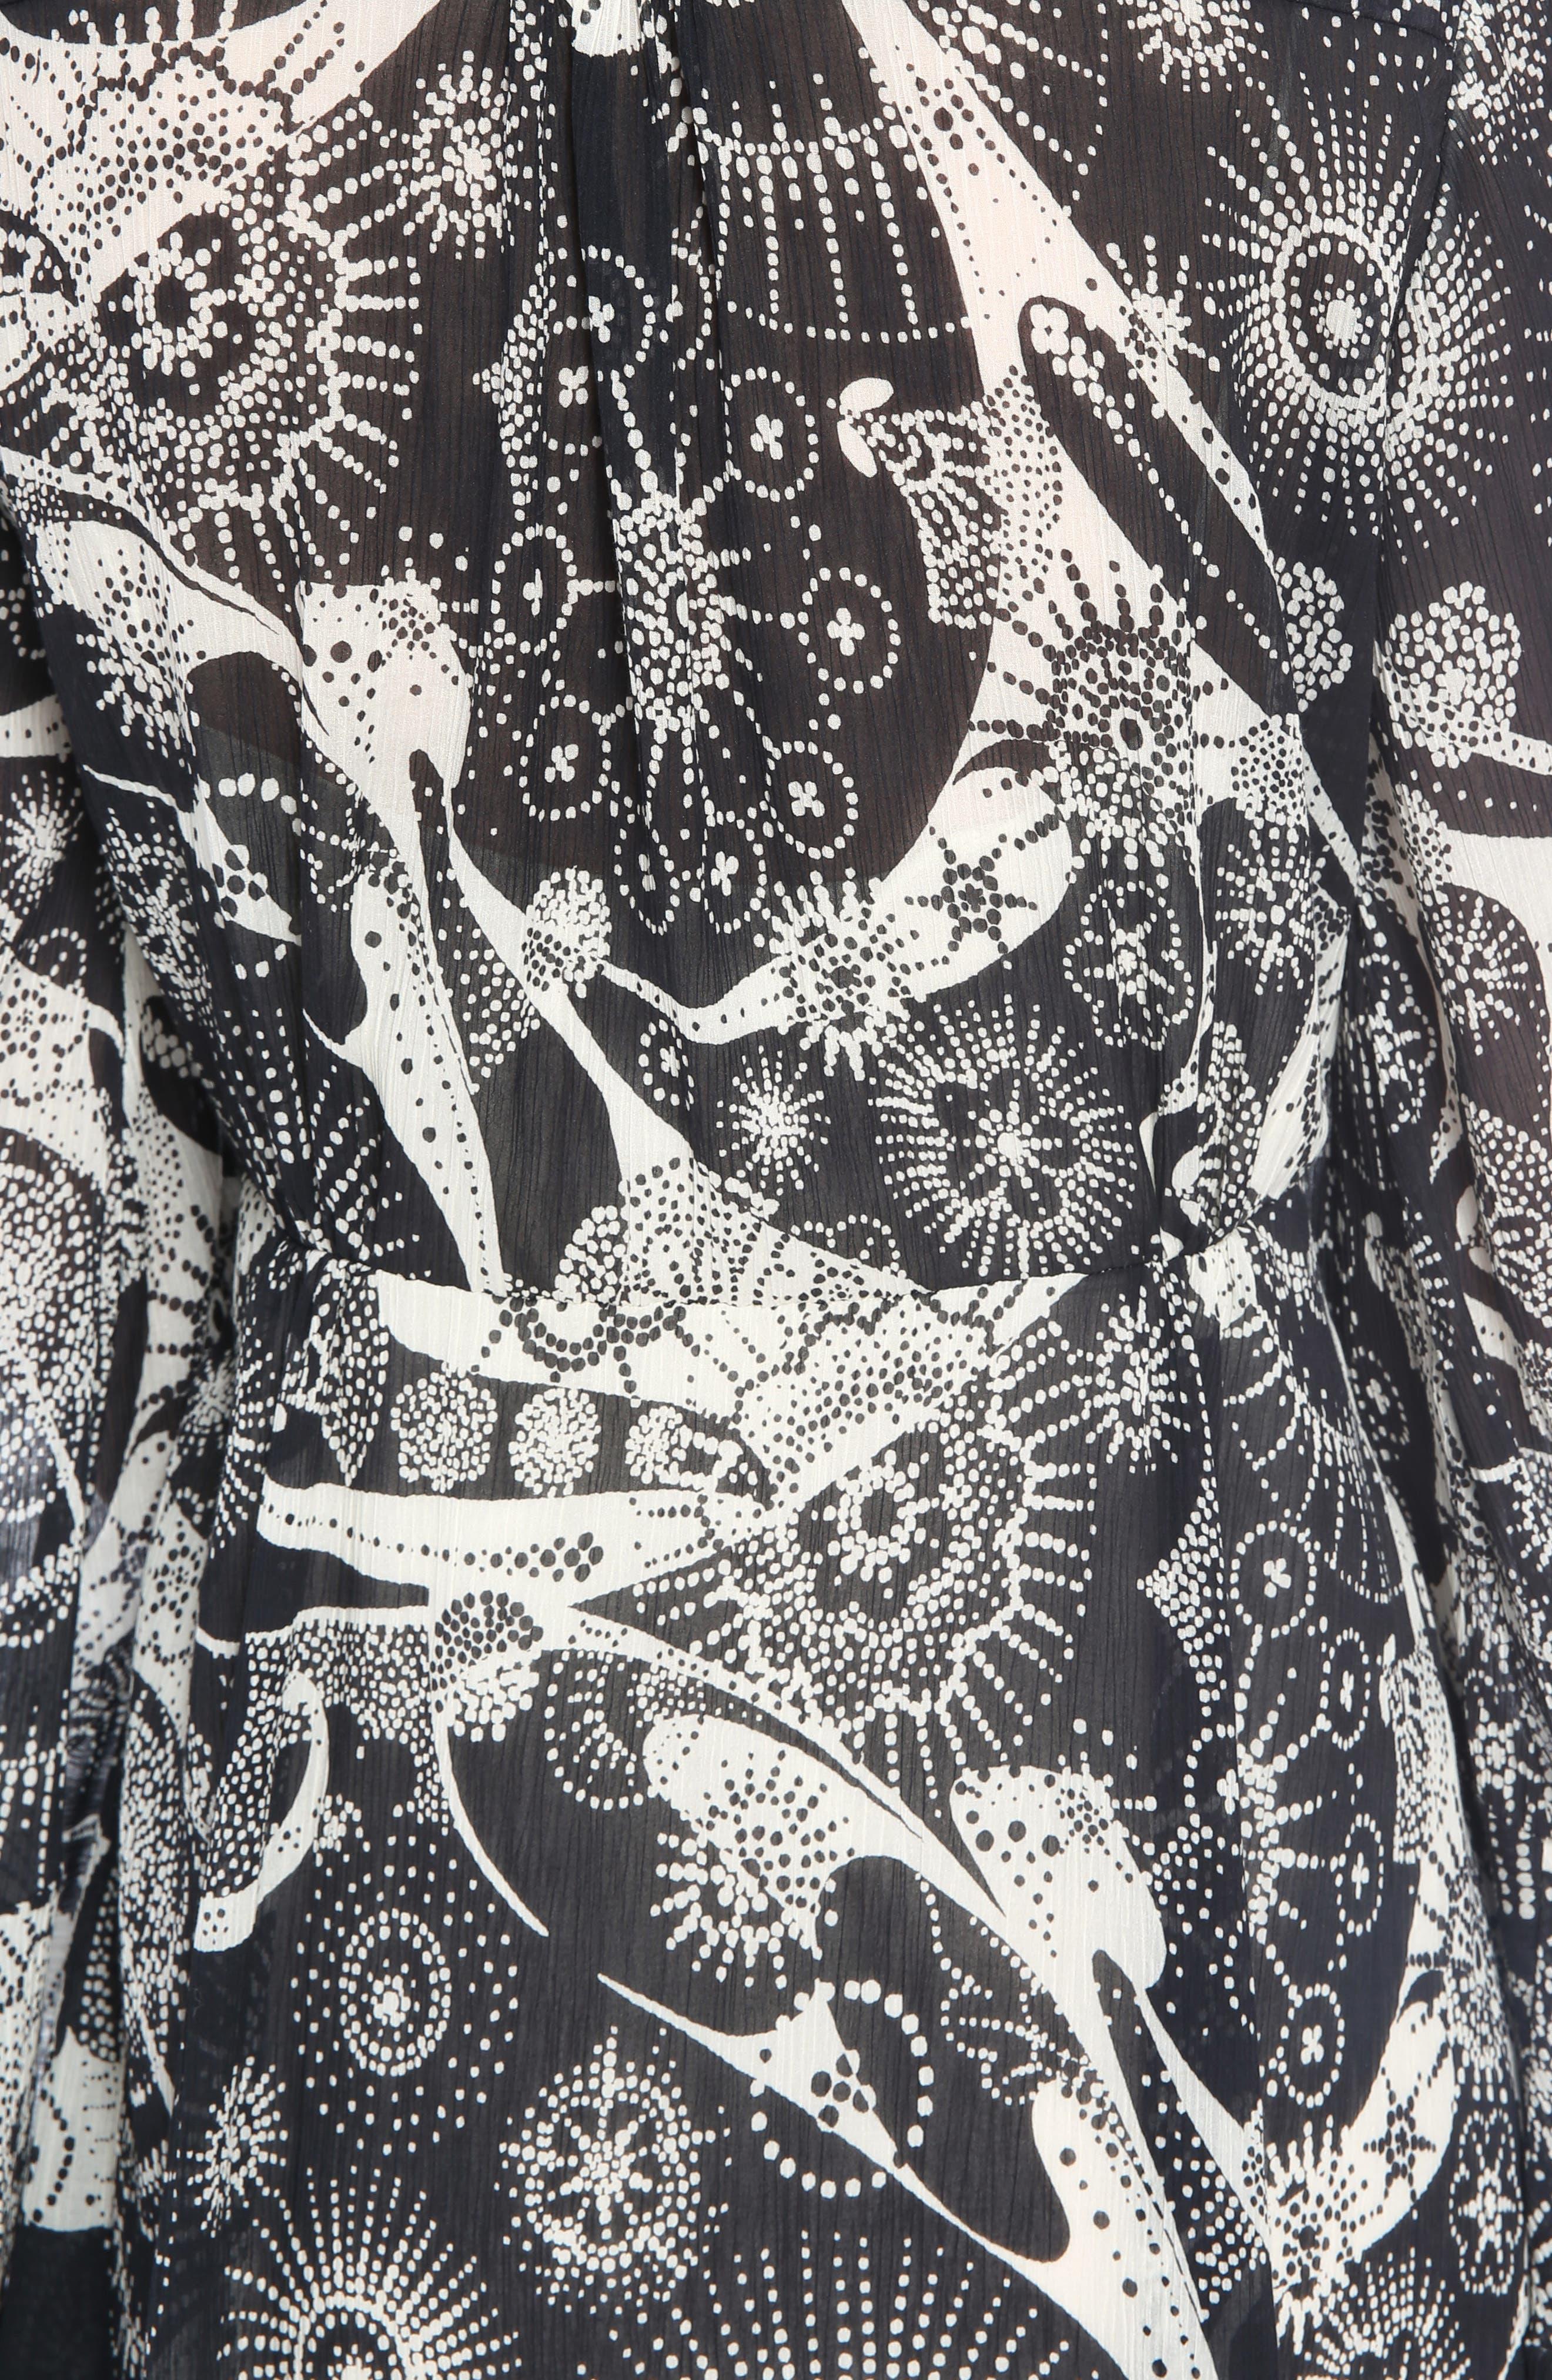 Dotty Ruffle Trim Crépon Dress with Scarf,                             Alternate thumbnail 5, color,                             Black-White